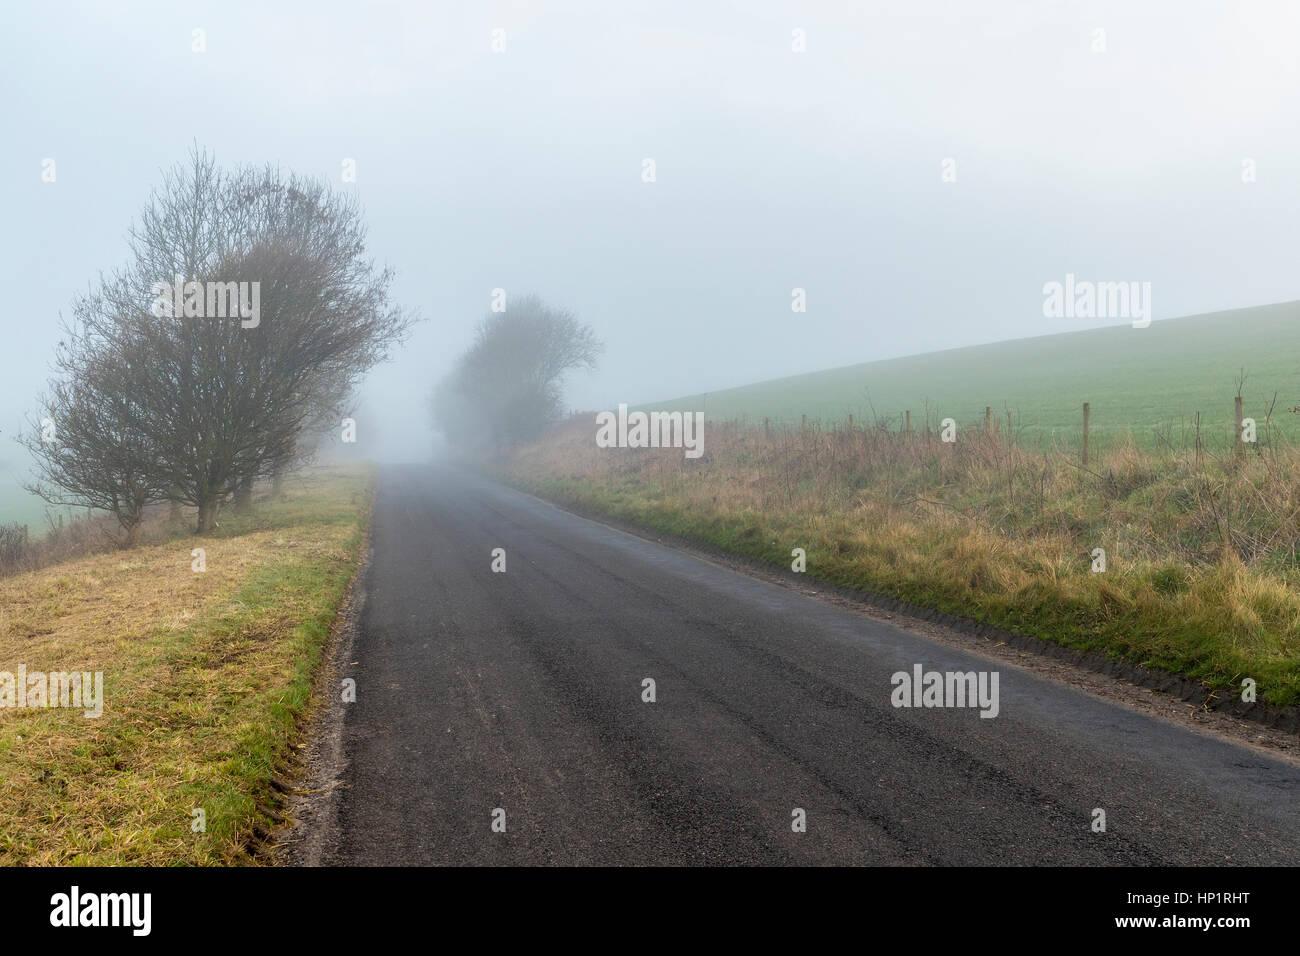 West Lulworth, Dorset, England. 18 February 2017. Mist morning in Dorset Credit: Sebastian Wasek/Alamy Live News - Stock Image